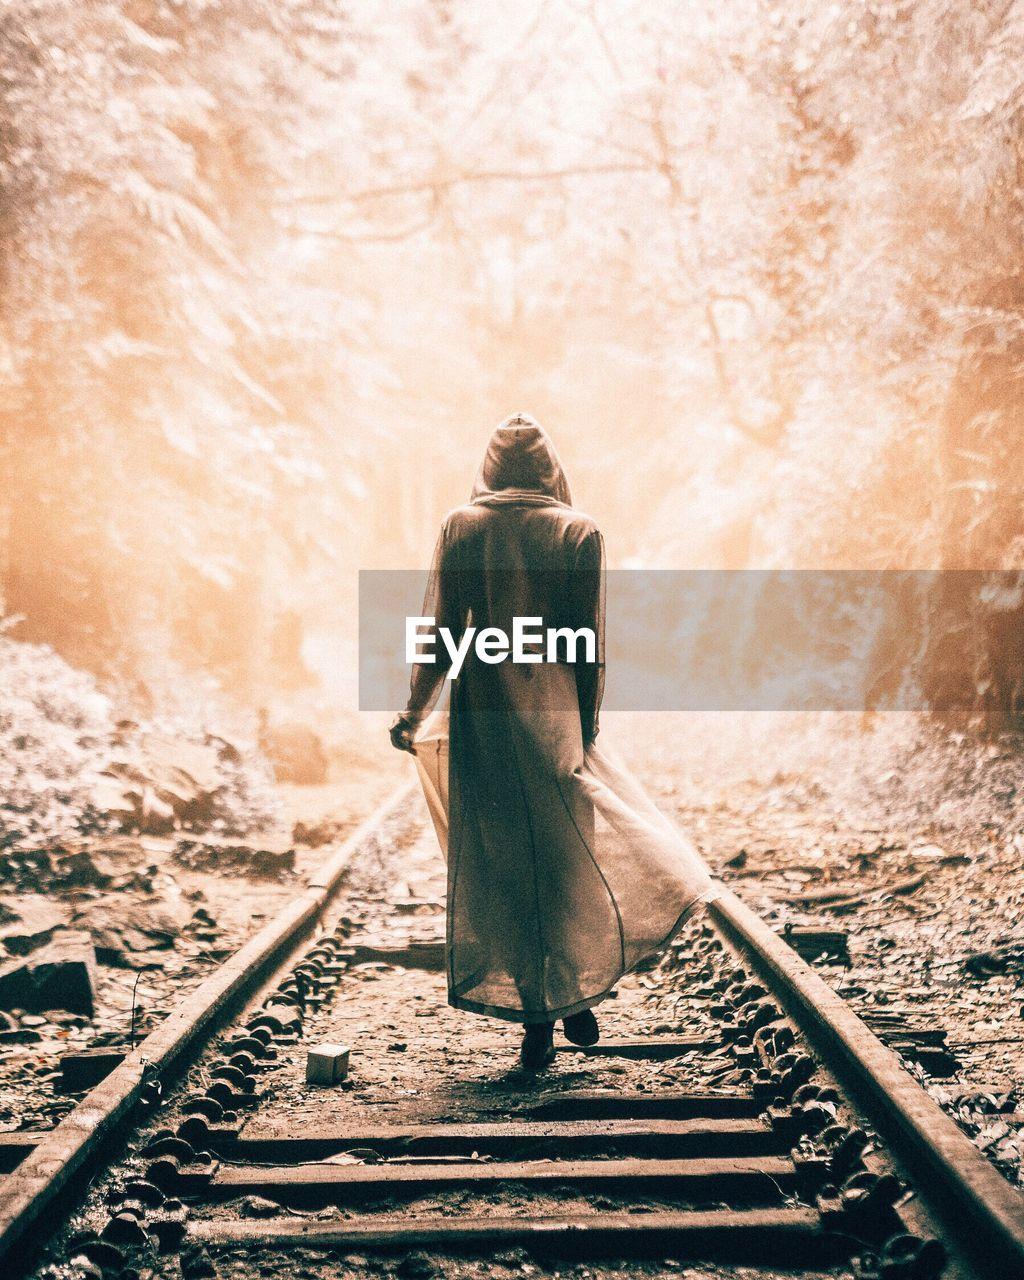 Rear View Full Length Of A Woman Walking On Railway Tracks